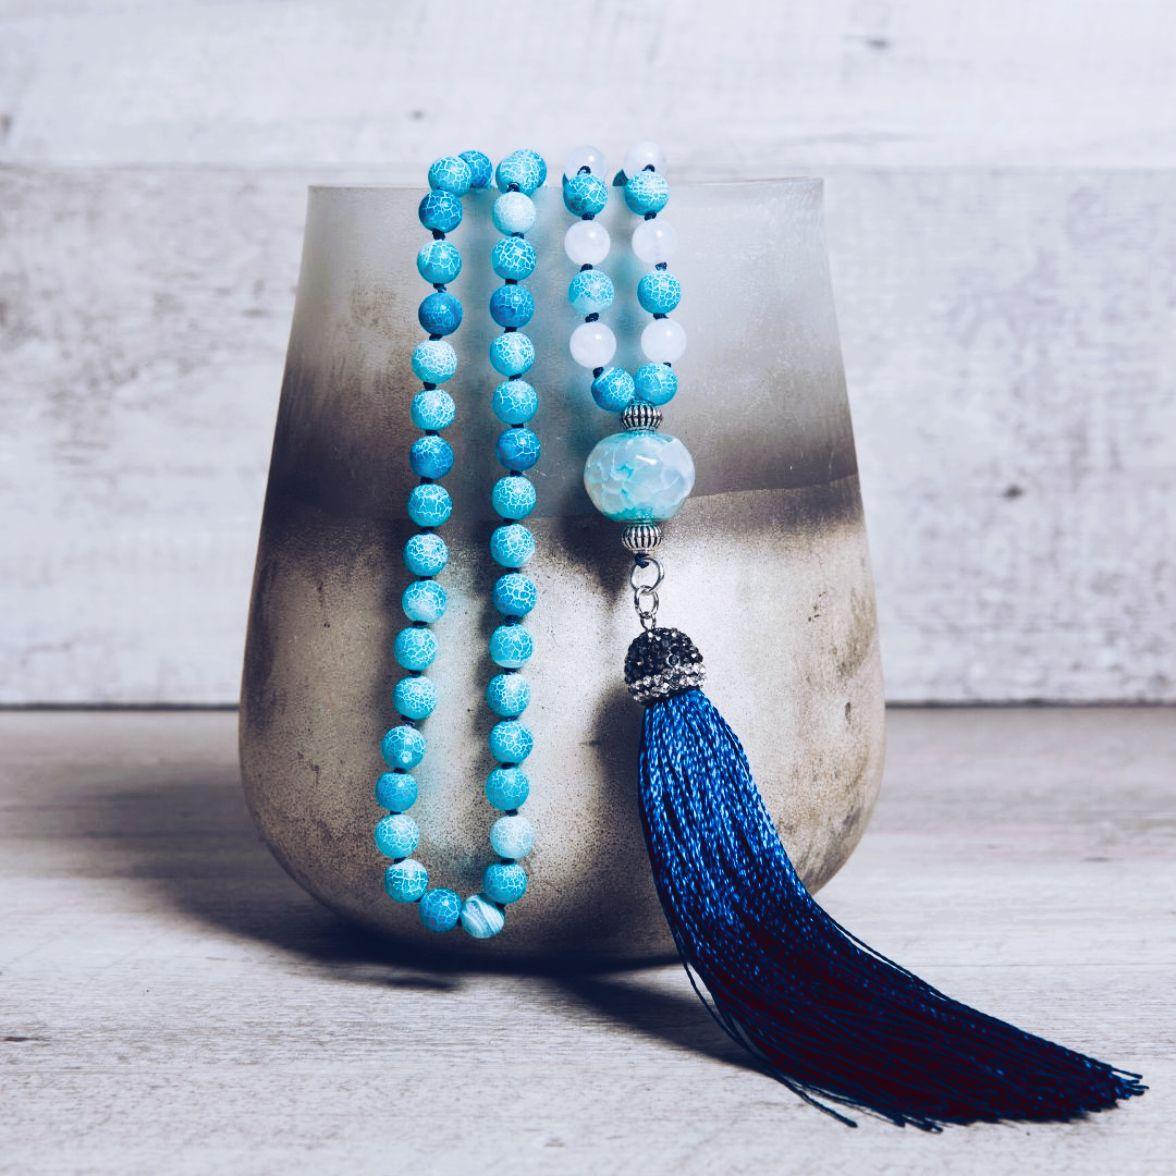 ғʀᴏsᴛᴇᴅ ᴄʀᴀᴄᴋʟᴇ ᴀɢᴀᴛᴇ ᴍᴀʟᴀ ɴᴇᴄᴋʟᴀᴄᴇ ‧ Who is looking forward to the summer?🌞😎  > >   ‧ #zodorart #beauthentic #etsycommunity #etsyshop #newcollection #ss20 #etsyhandmadejewelry #handmadejewelrydesigner #oneofakindjewelry